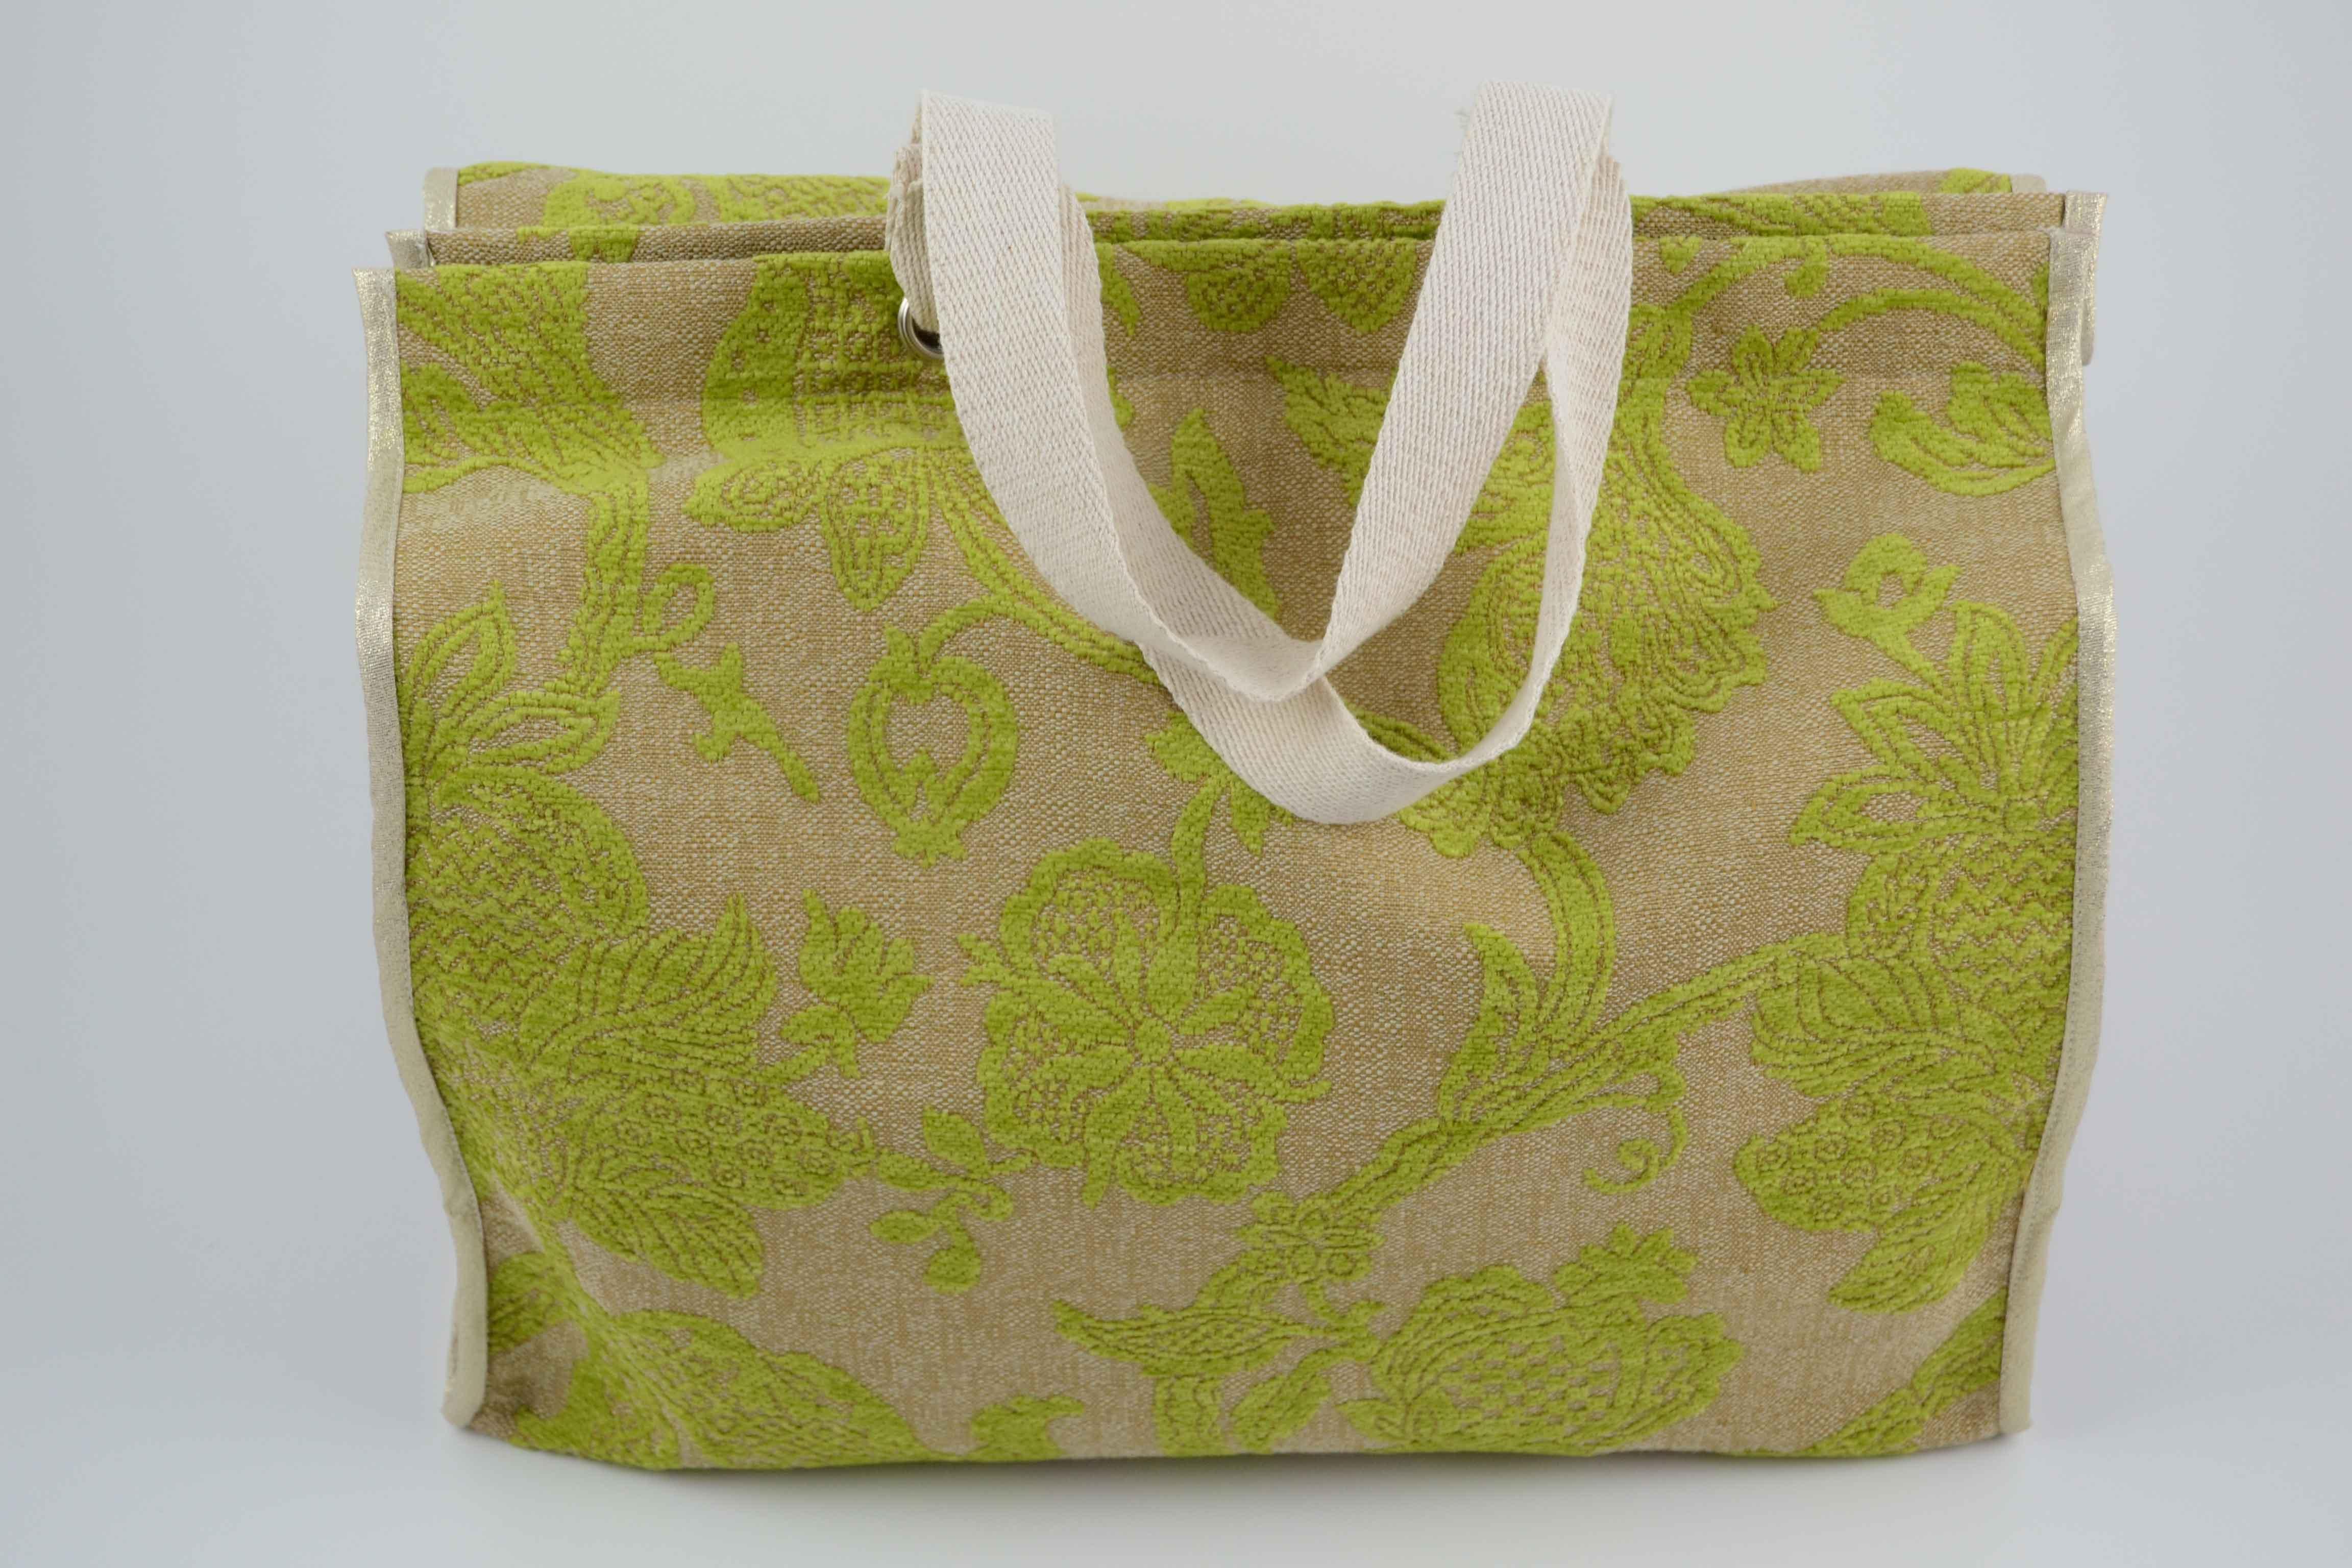 8bacd6353 Bolso de tela de tapicería verde lima - La Sombrerera